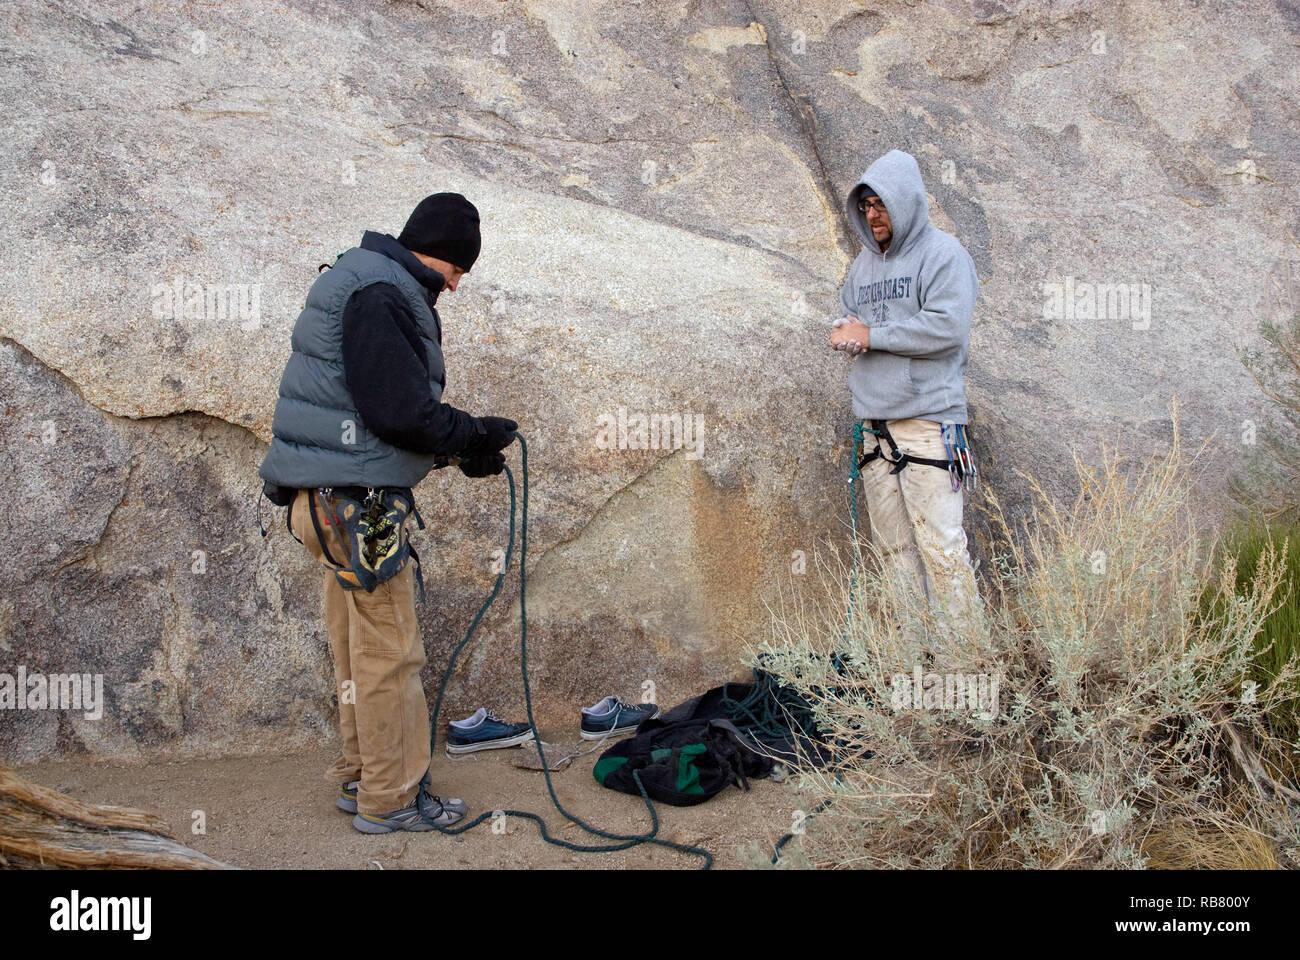 Rock climbers preparing to climb a rock on cold winter morning in Alabama Hills near Lone Pine in Eastern Sierra Nevada, California, USA - Stock Image